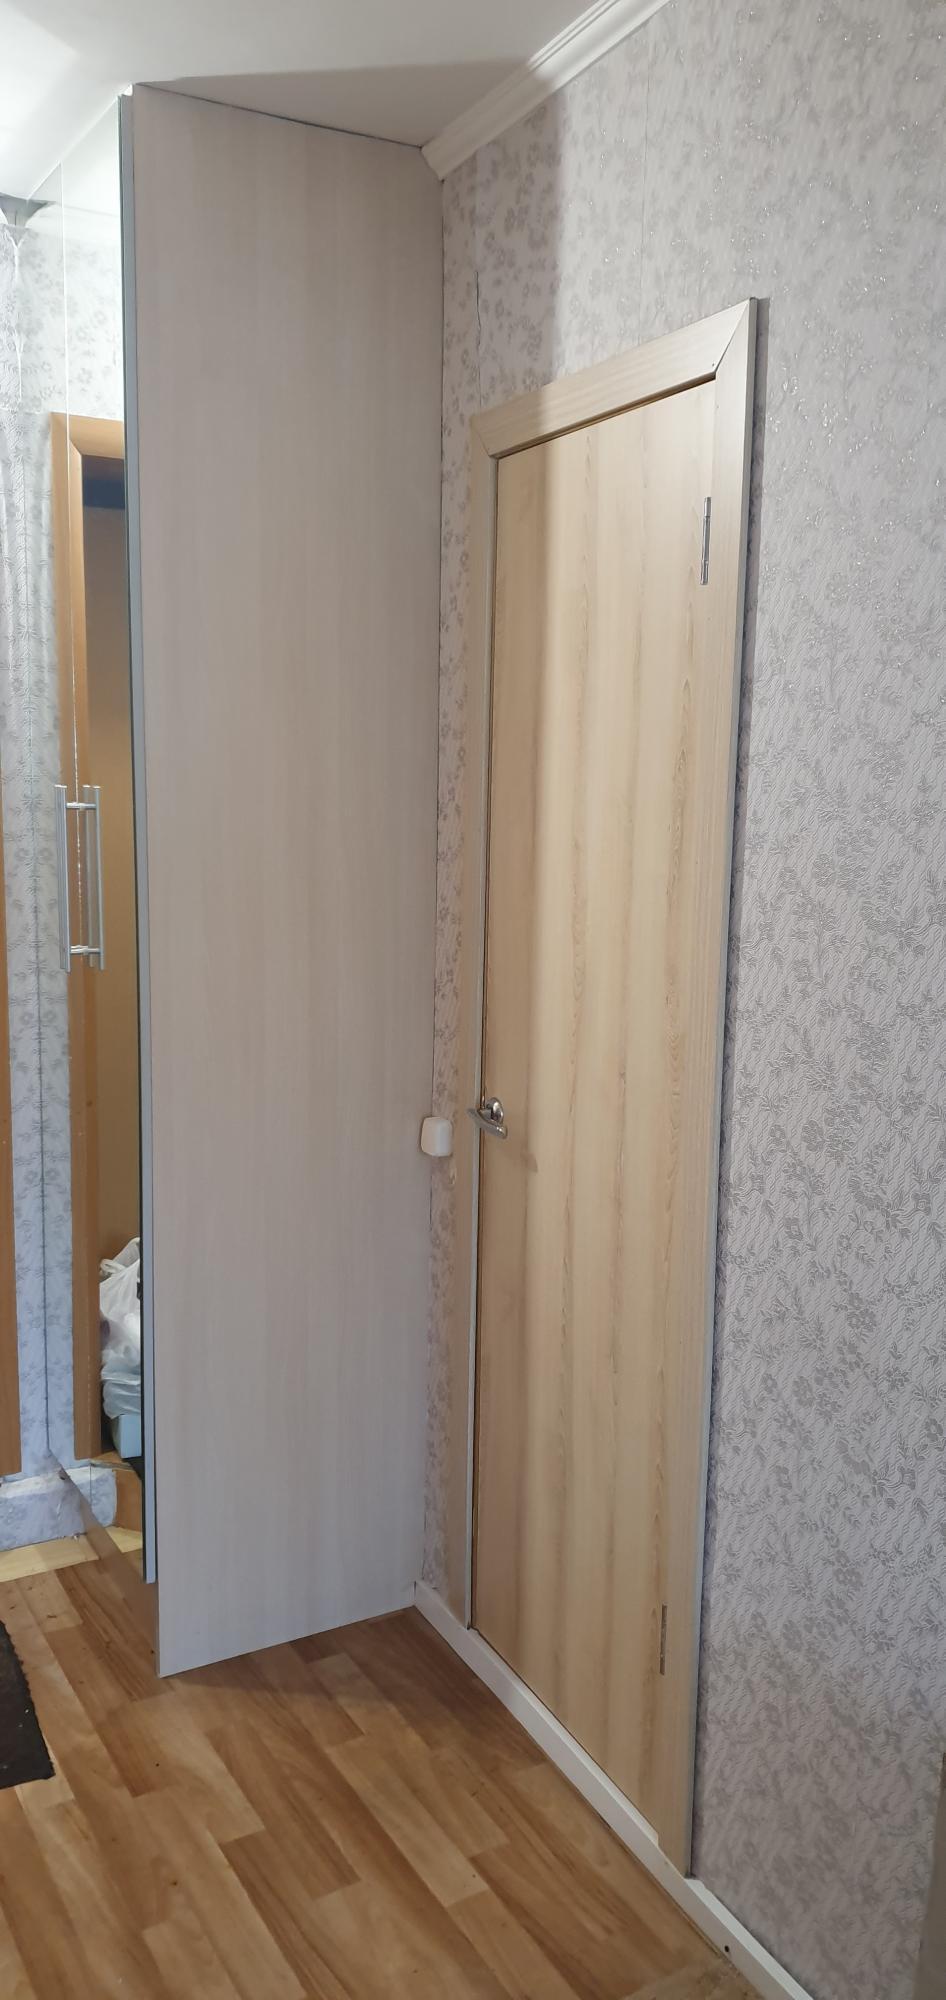 1к квартира улица Семафорная, 259   11000   аренда в Красноярске фото 3